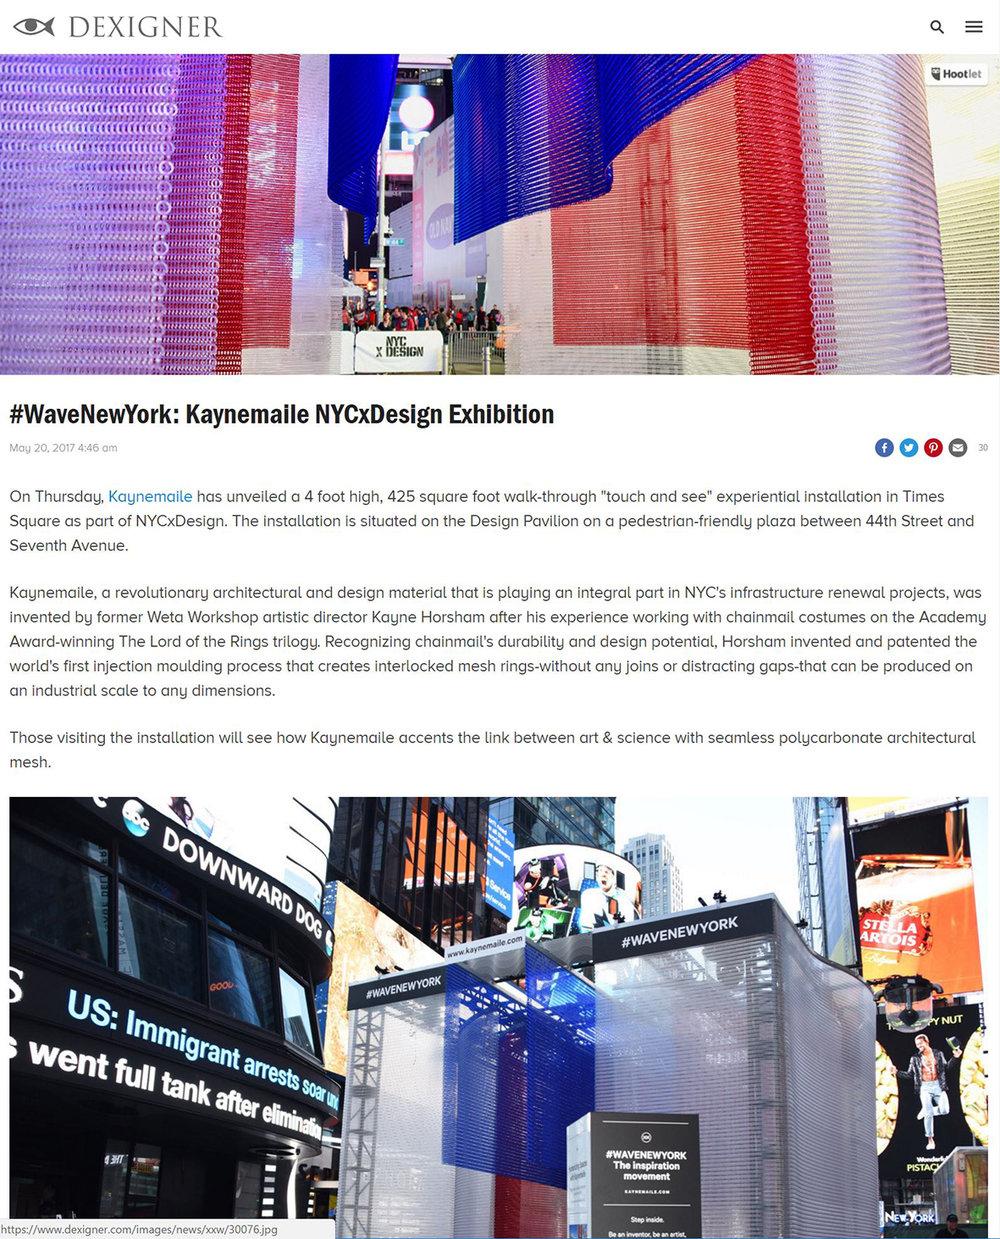 Wave New York Kaynemaile NYCxDesign Exhibition